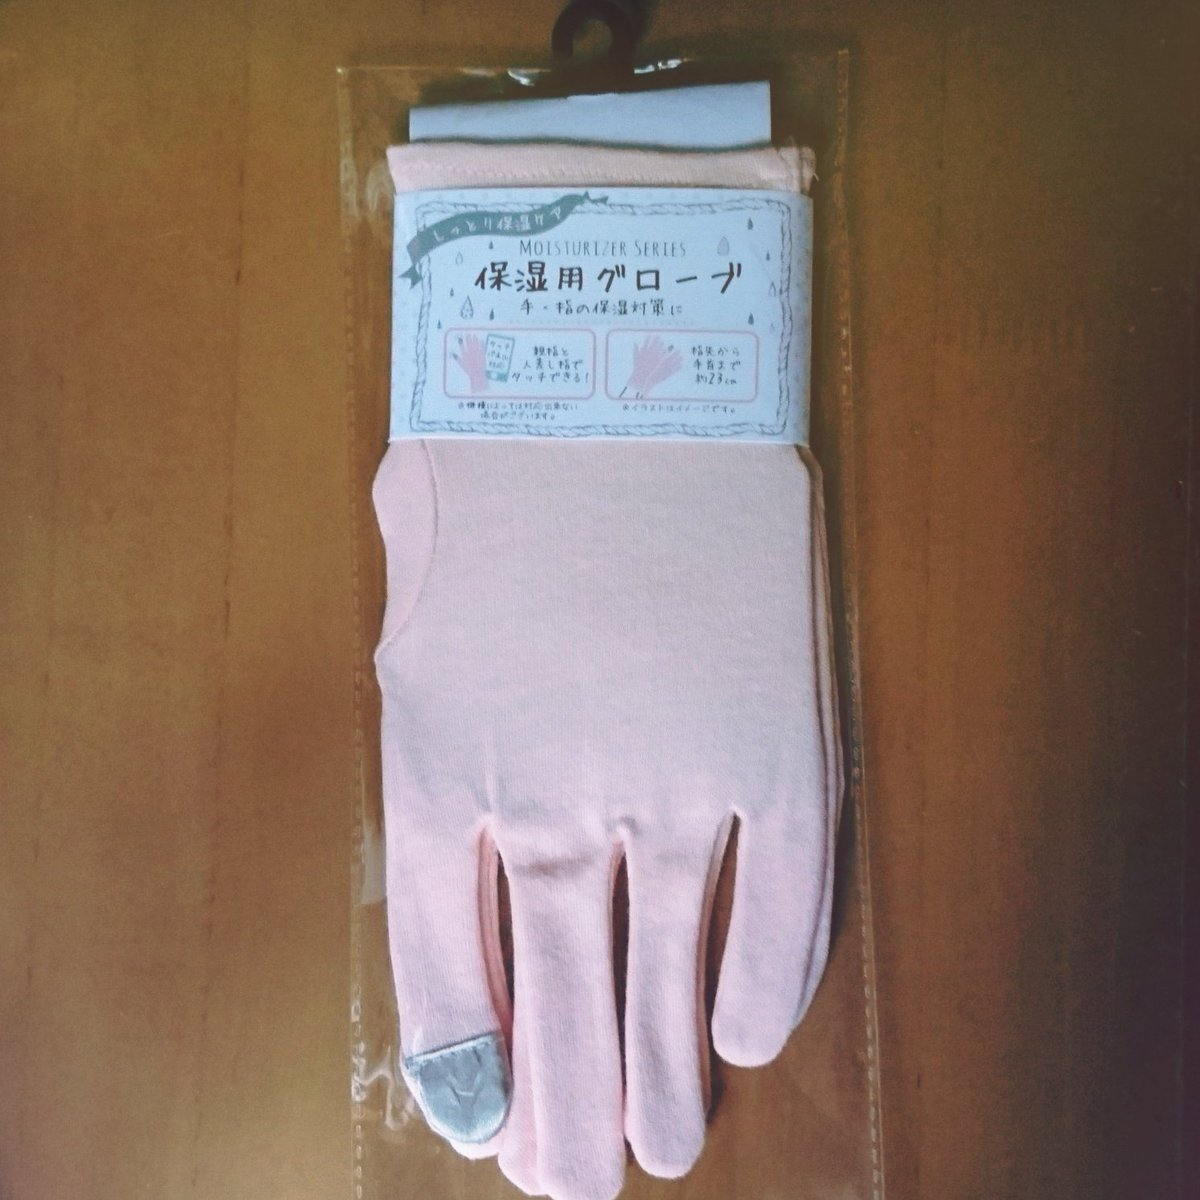 test ツイッターメディア - #キャンドゥ #保湿用グローブ 寝る前にベビーオイルとハンドクリームとヒビケア塗ってこれ付ける。最強。 寝ながらスマホもいじれる。最高。 https://t.co/kA3lOz8S9W